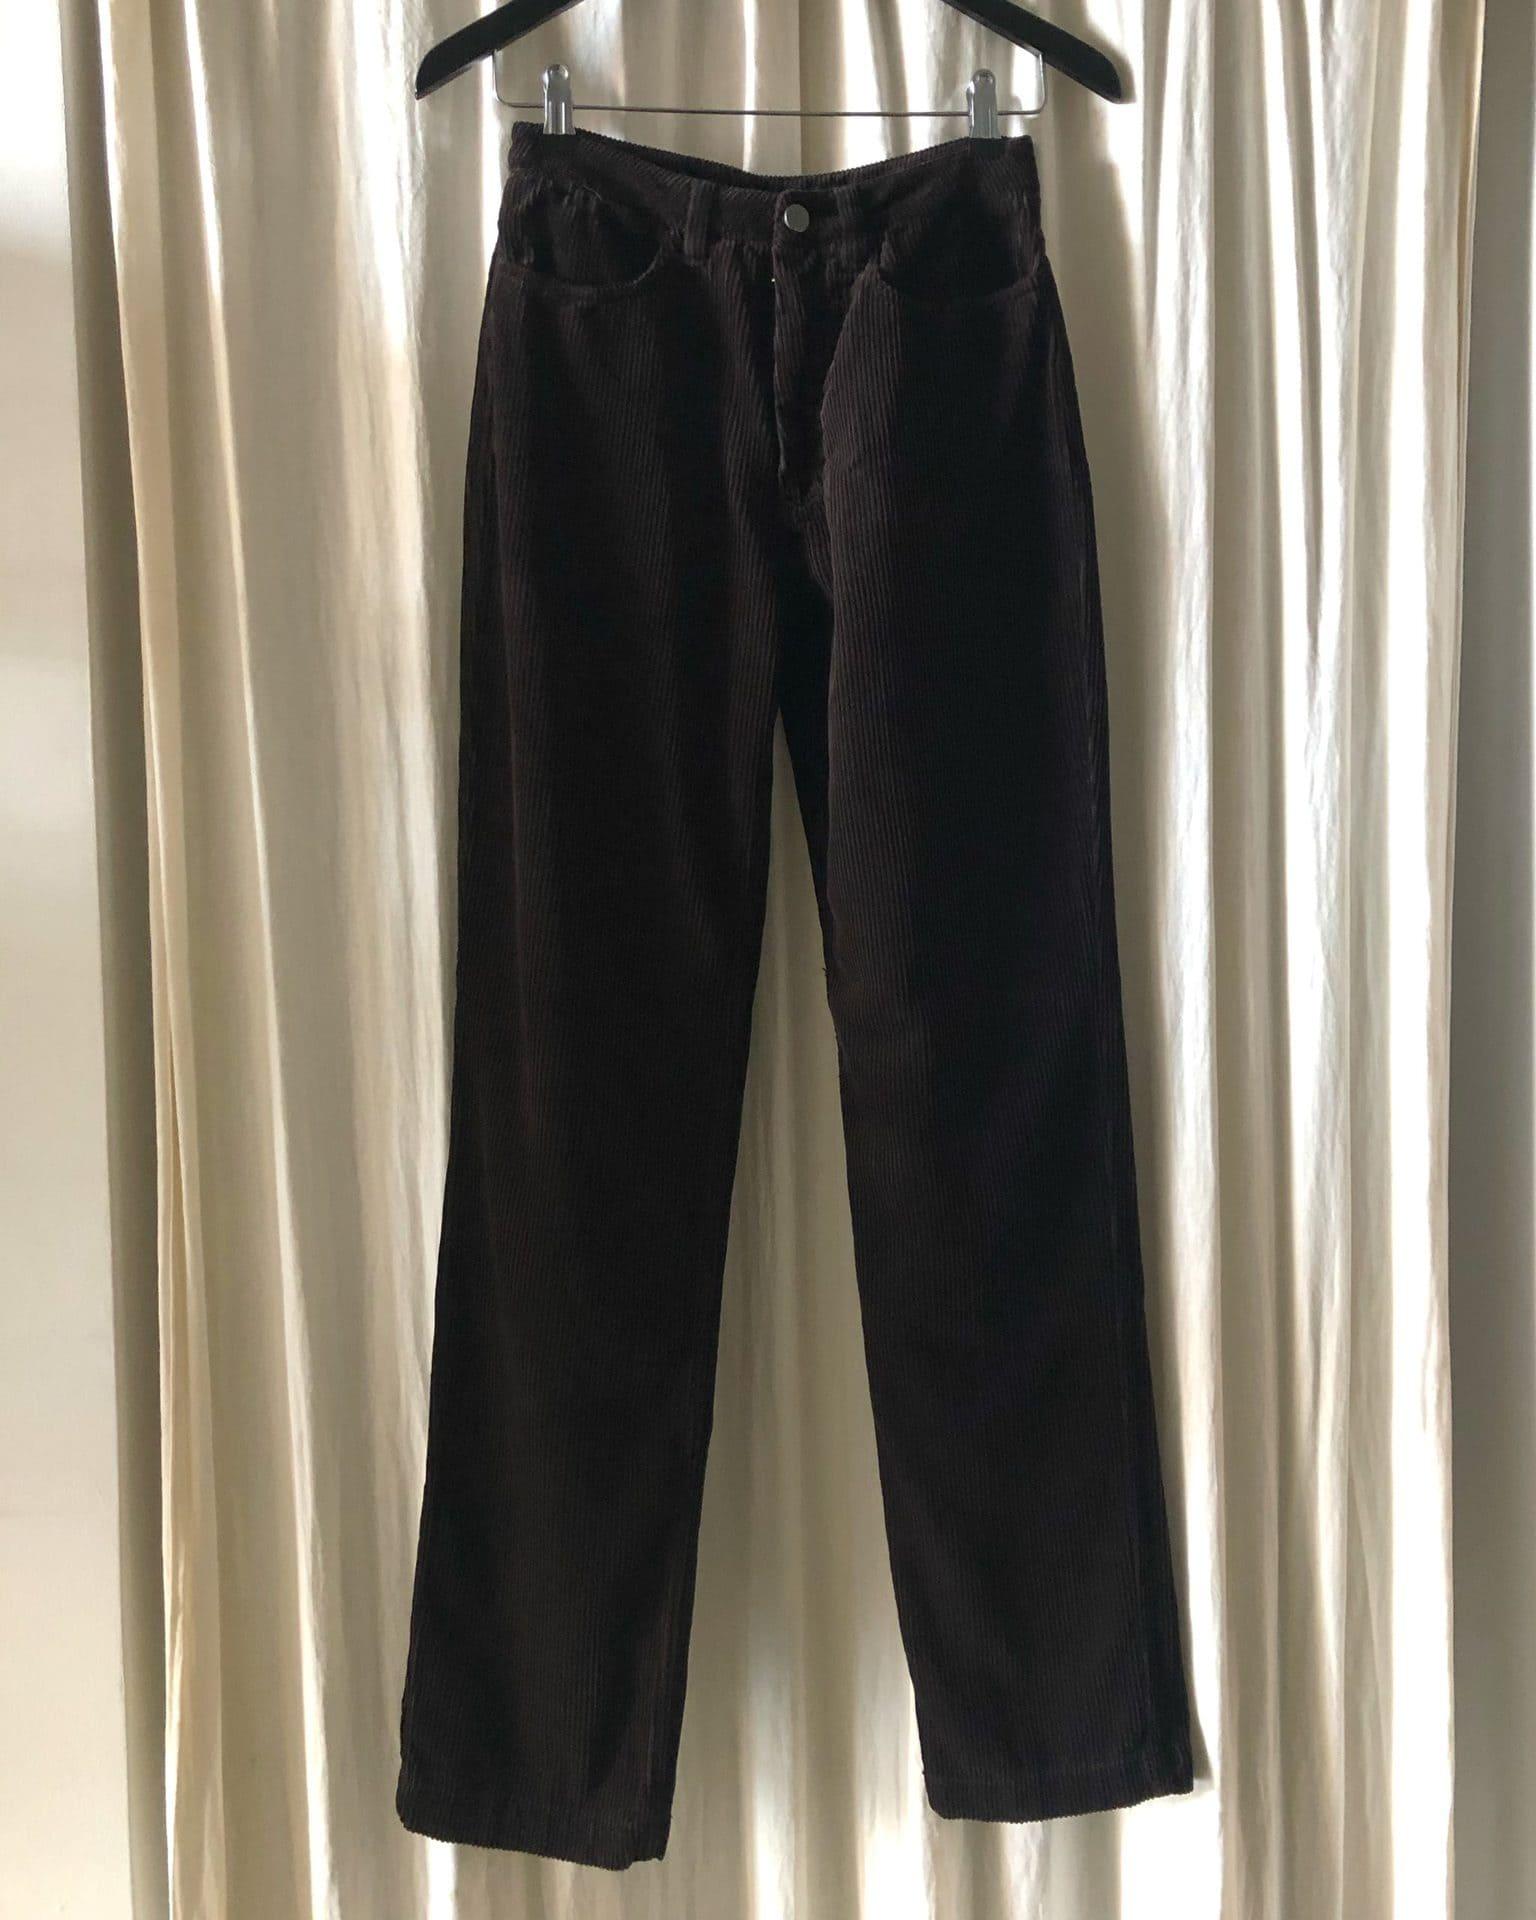 Kay – high waist organic cotton corduroy trousers